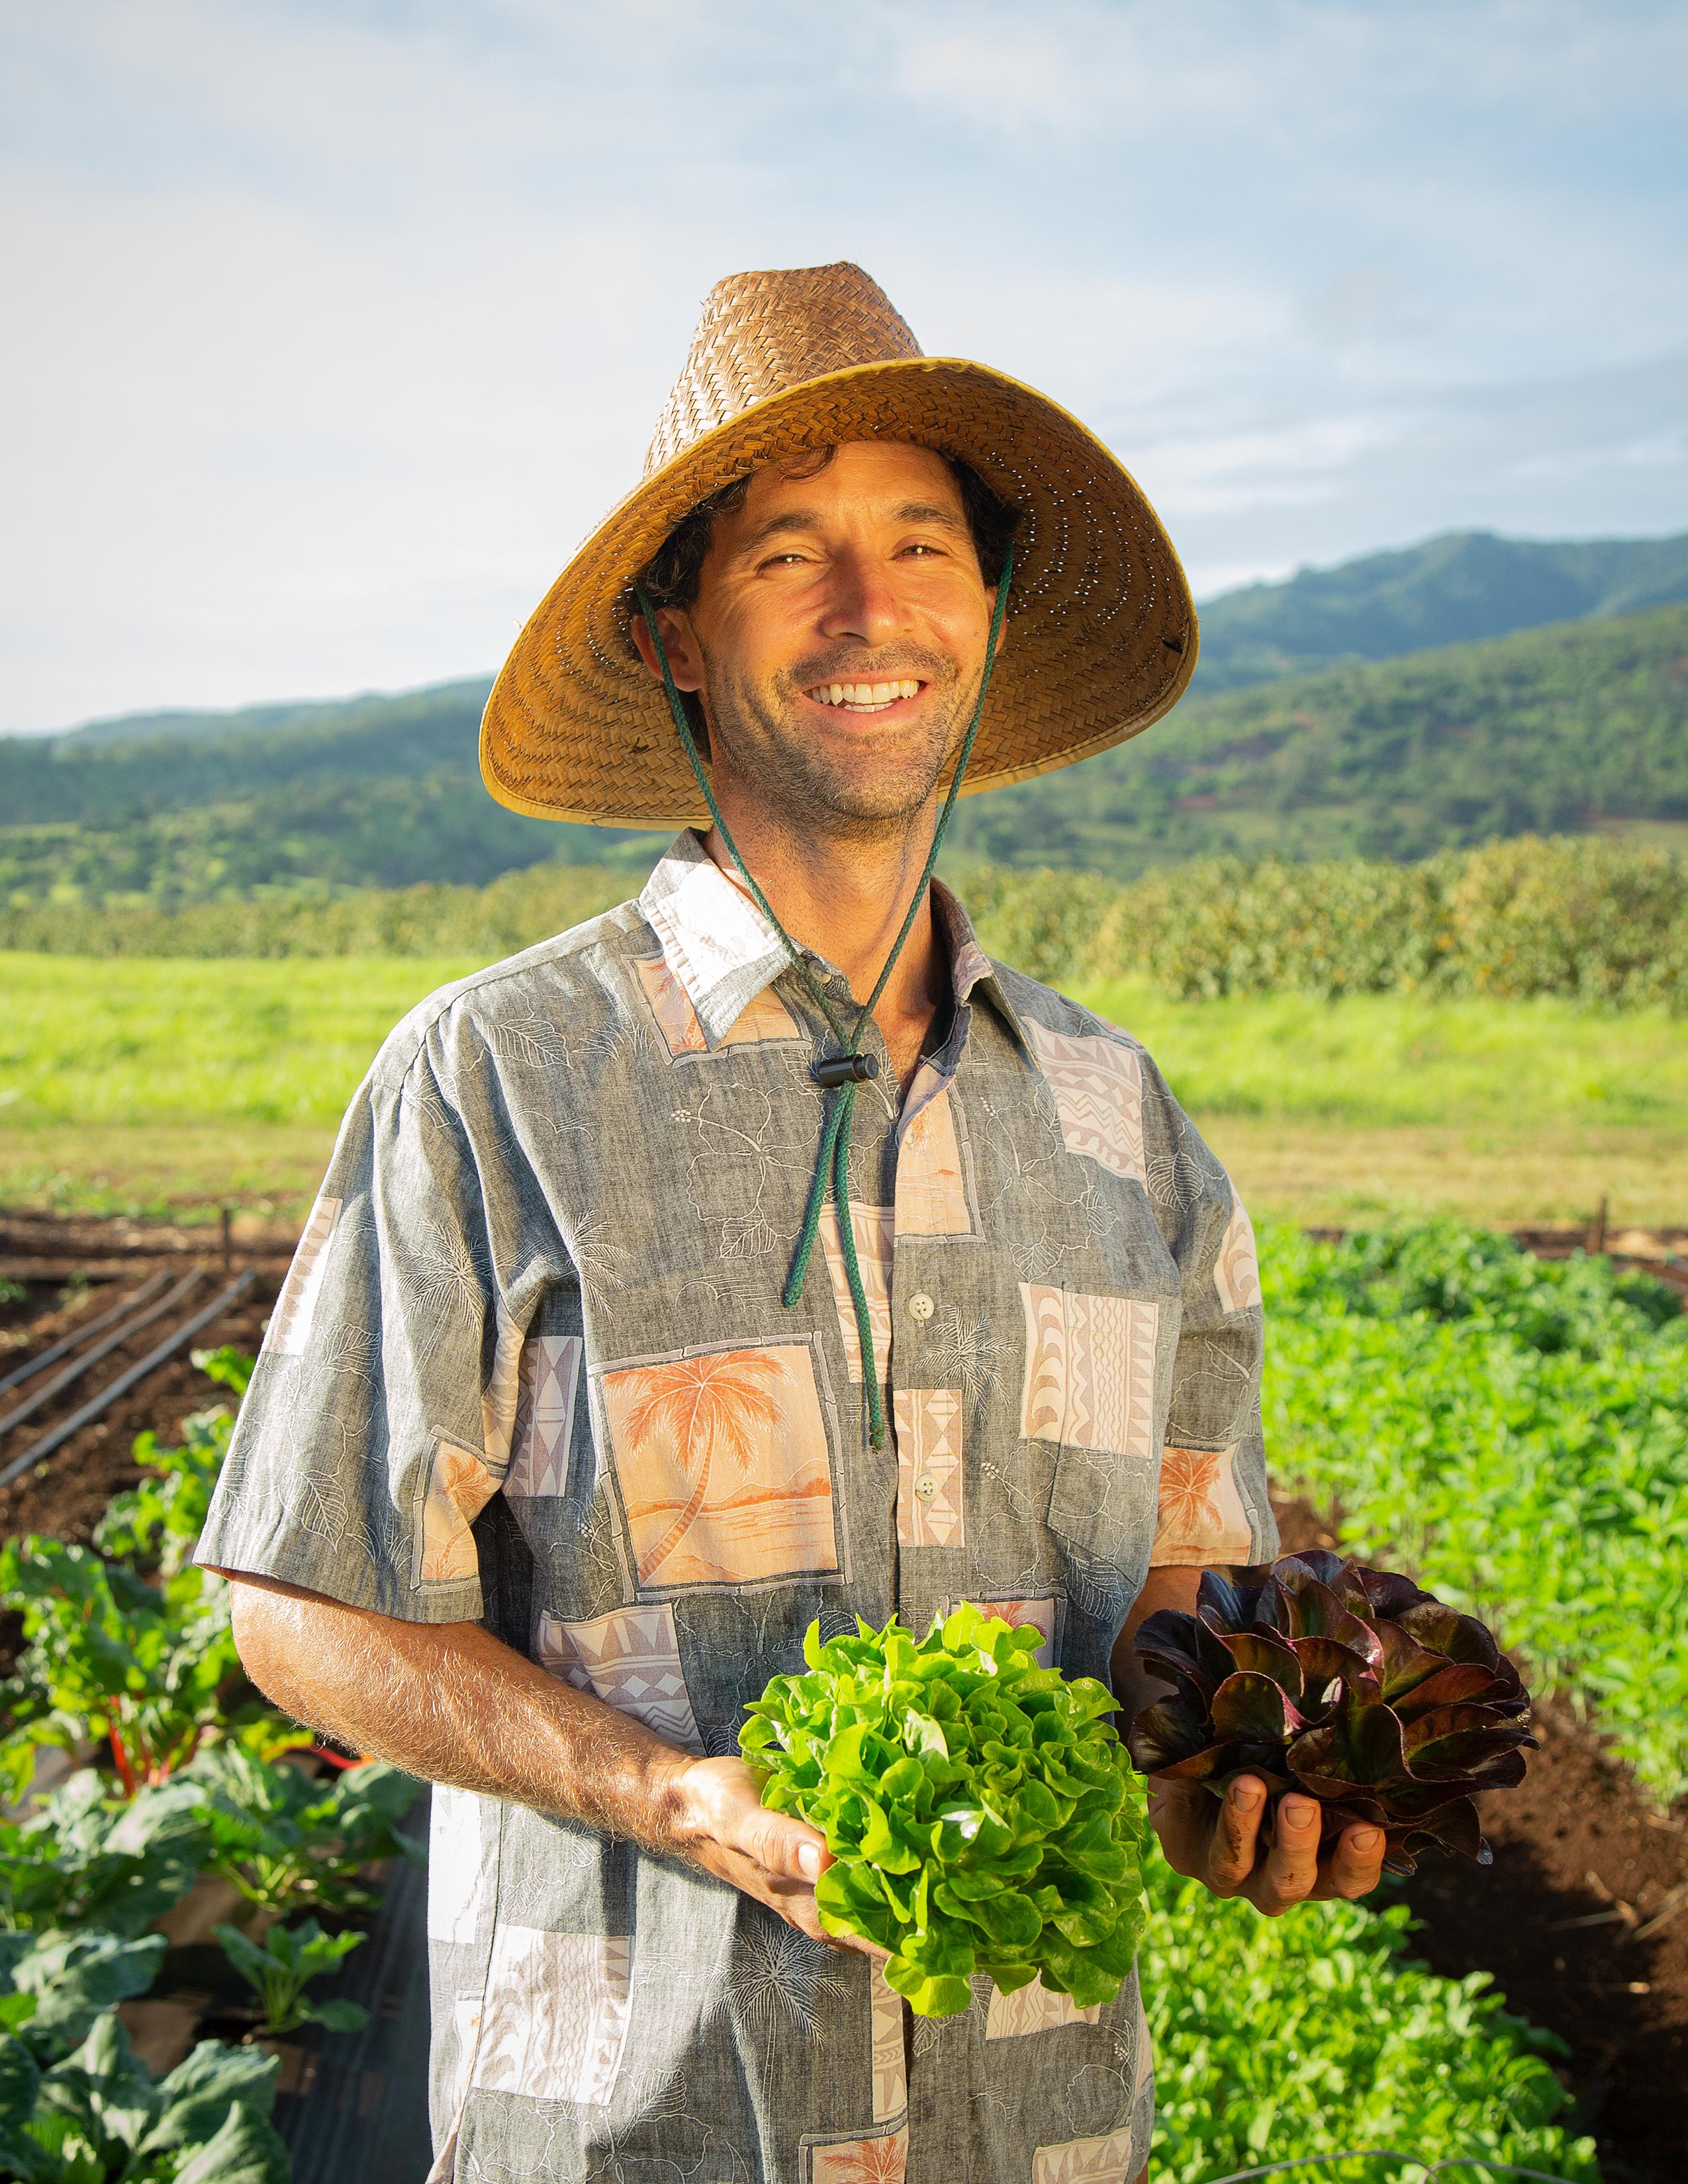 Farmer Carey